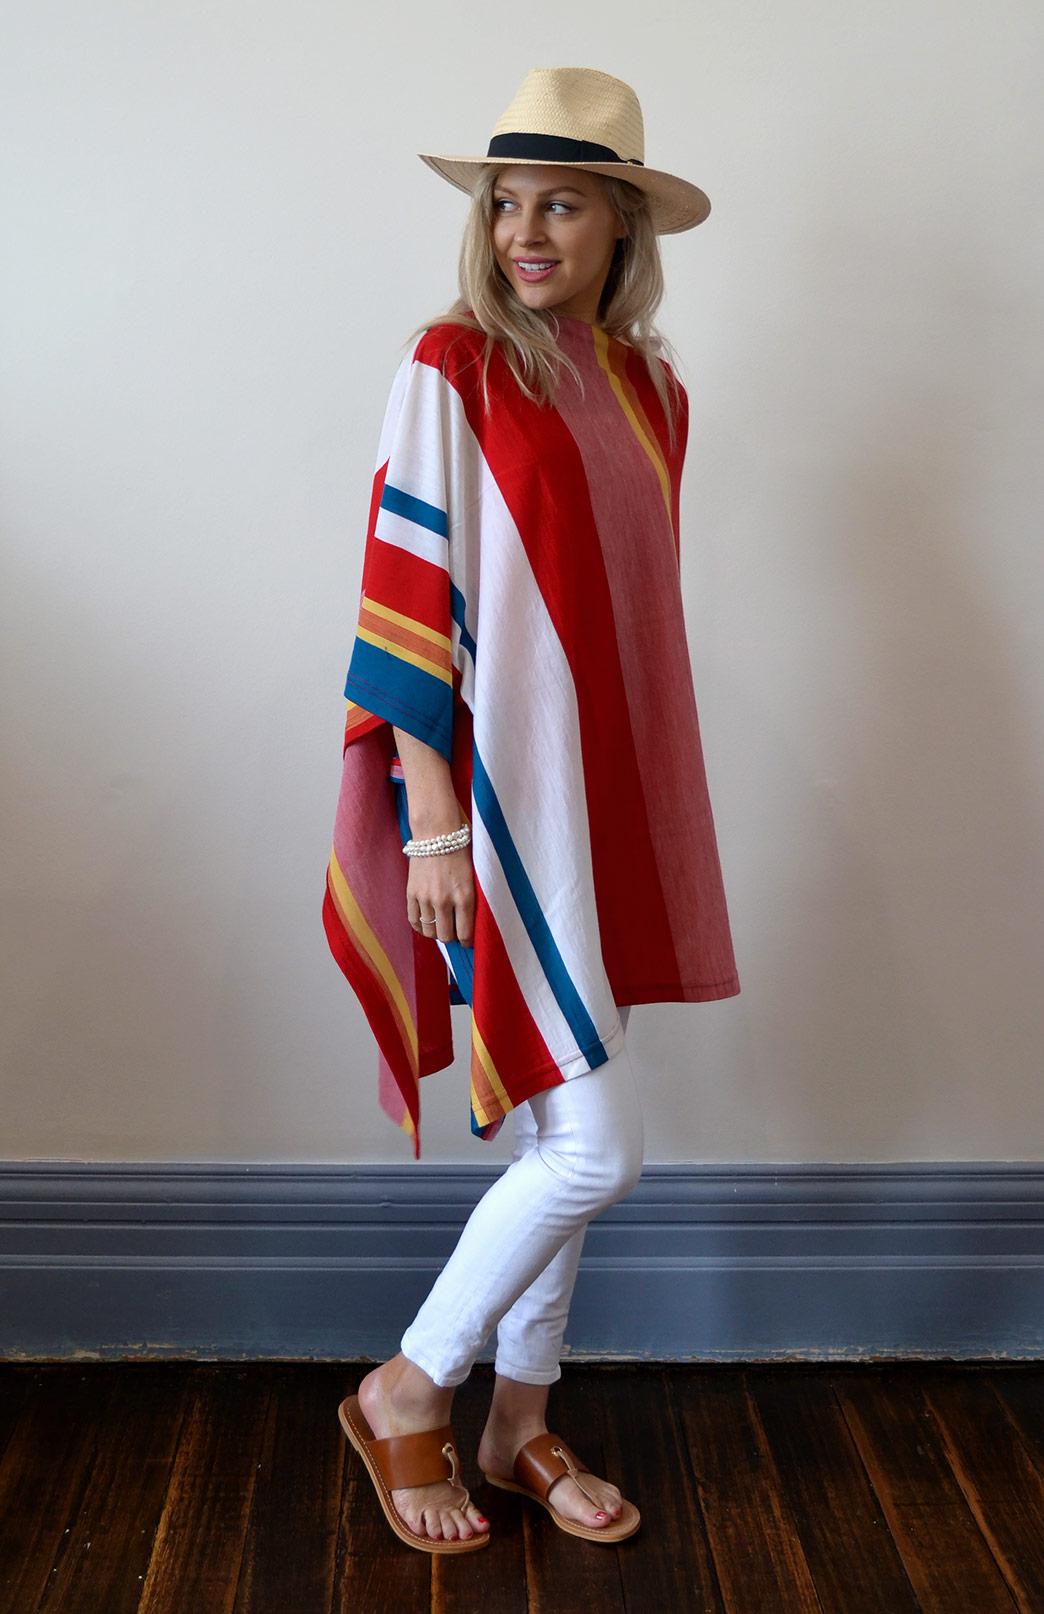 Oversized Poncho - Striped & Patterned - Women's Red and Yellow Striped Oversized Wool Poncho - Smitten Merino Tasmania Australia